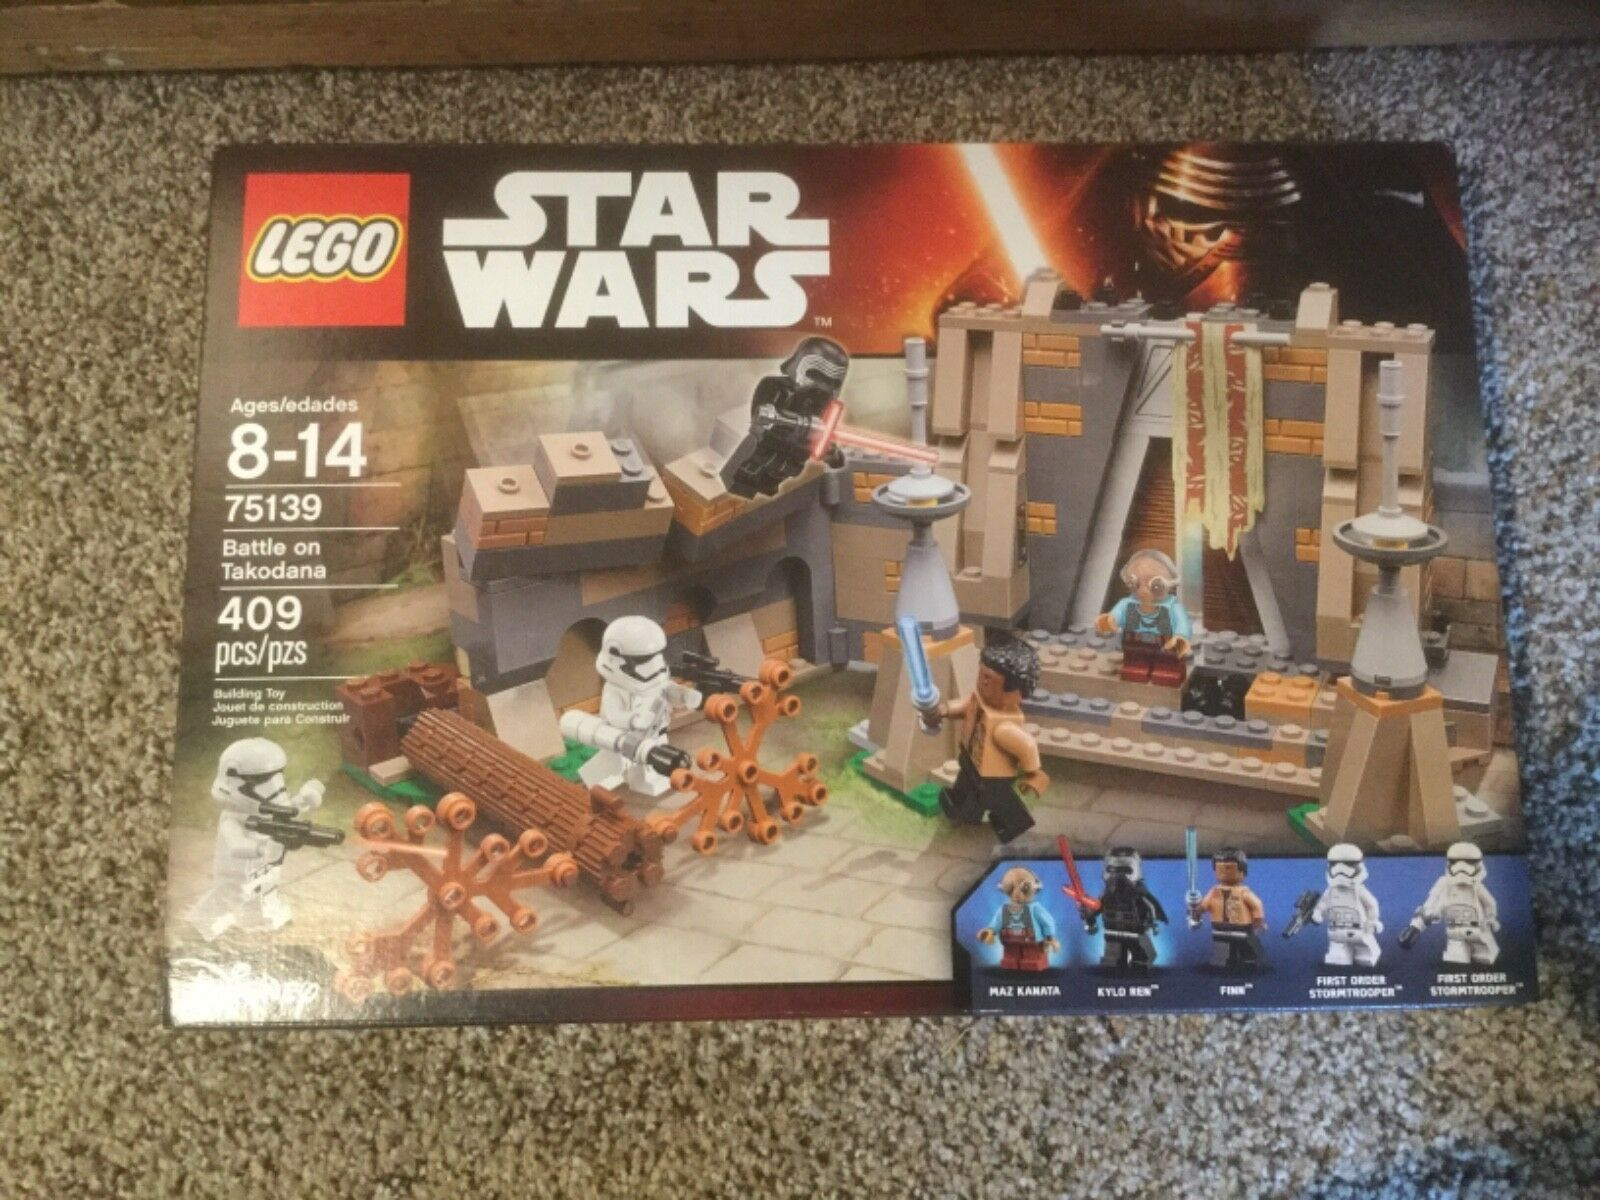 Nuovo in box Lego Star Wars Battle on Takodana. 75139